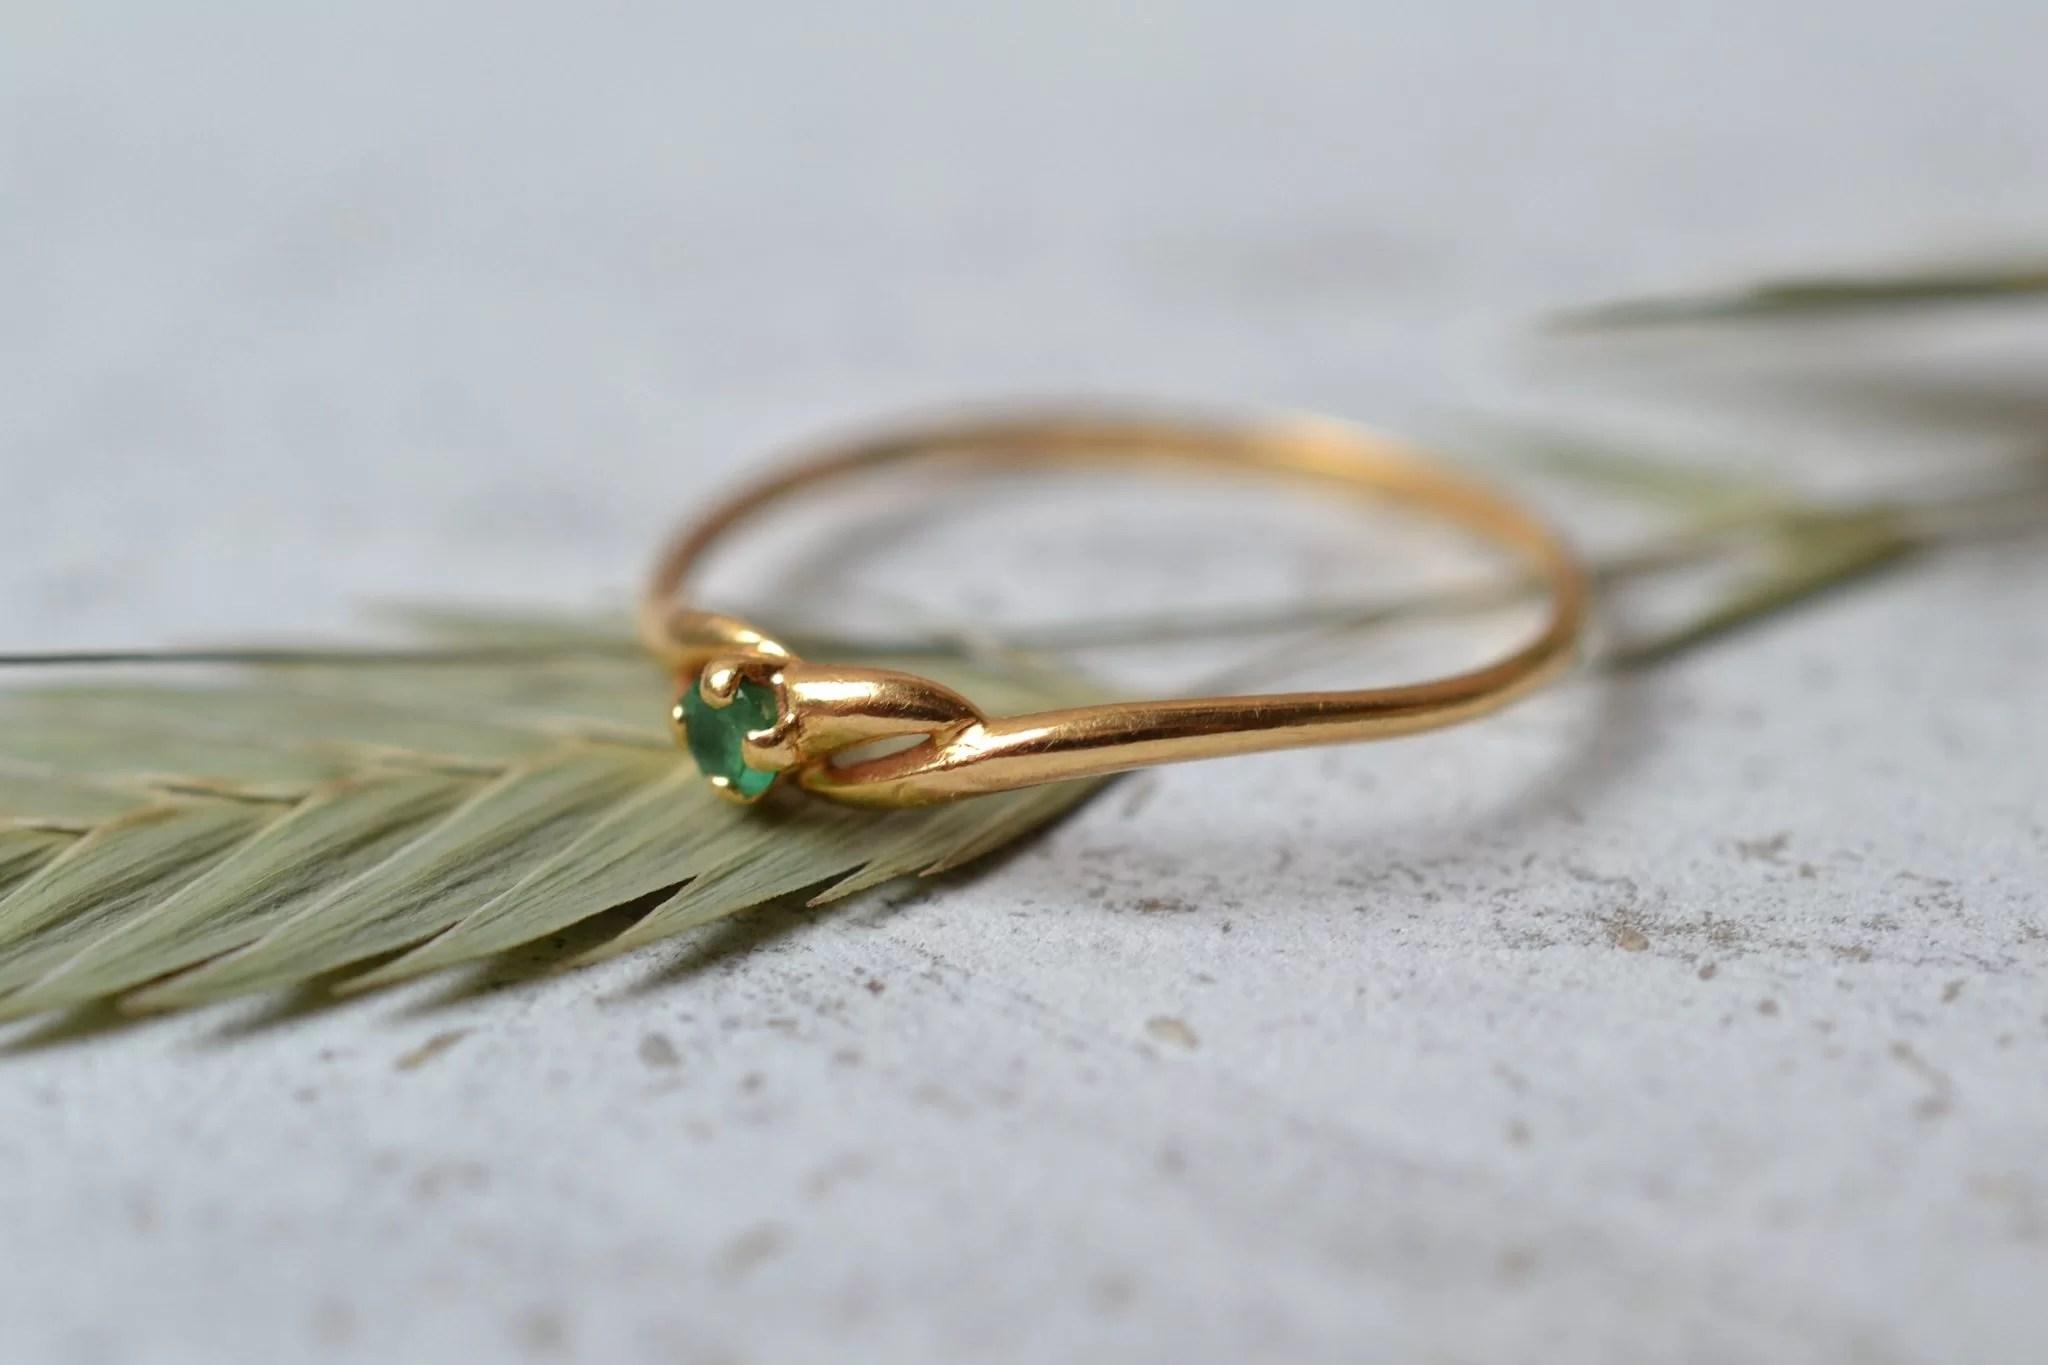 Bague en Or jaune sertie d_une petite pierre verte - bague Vintage